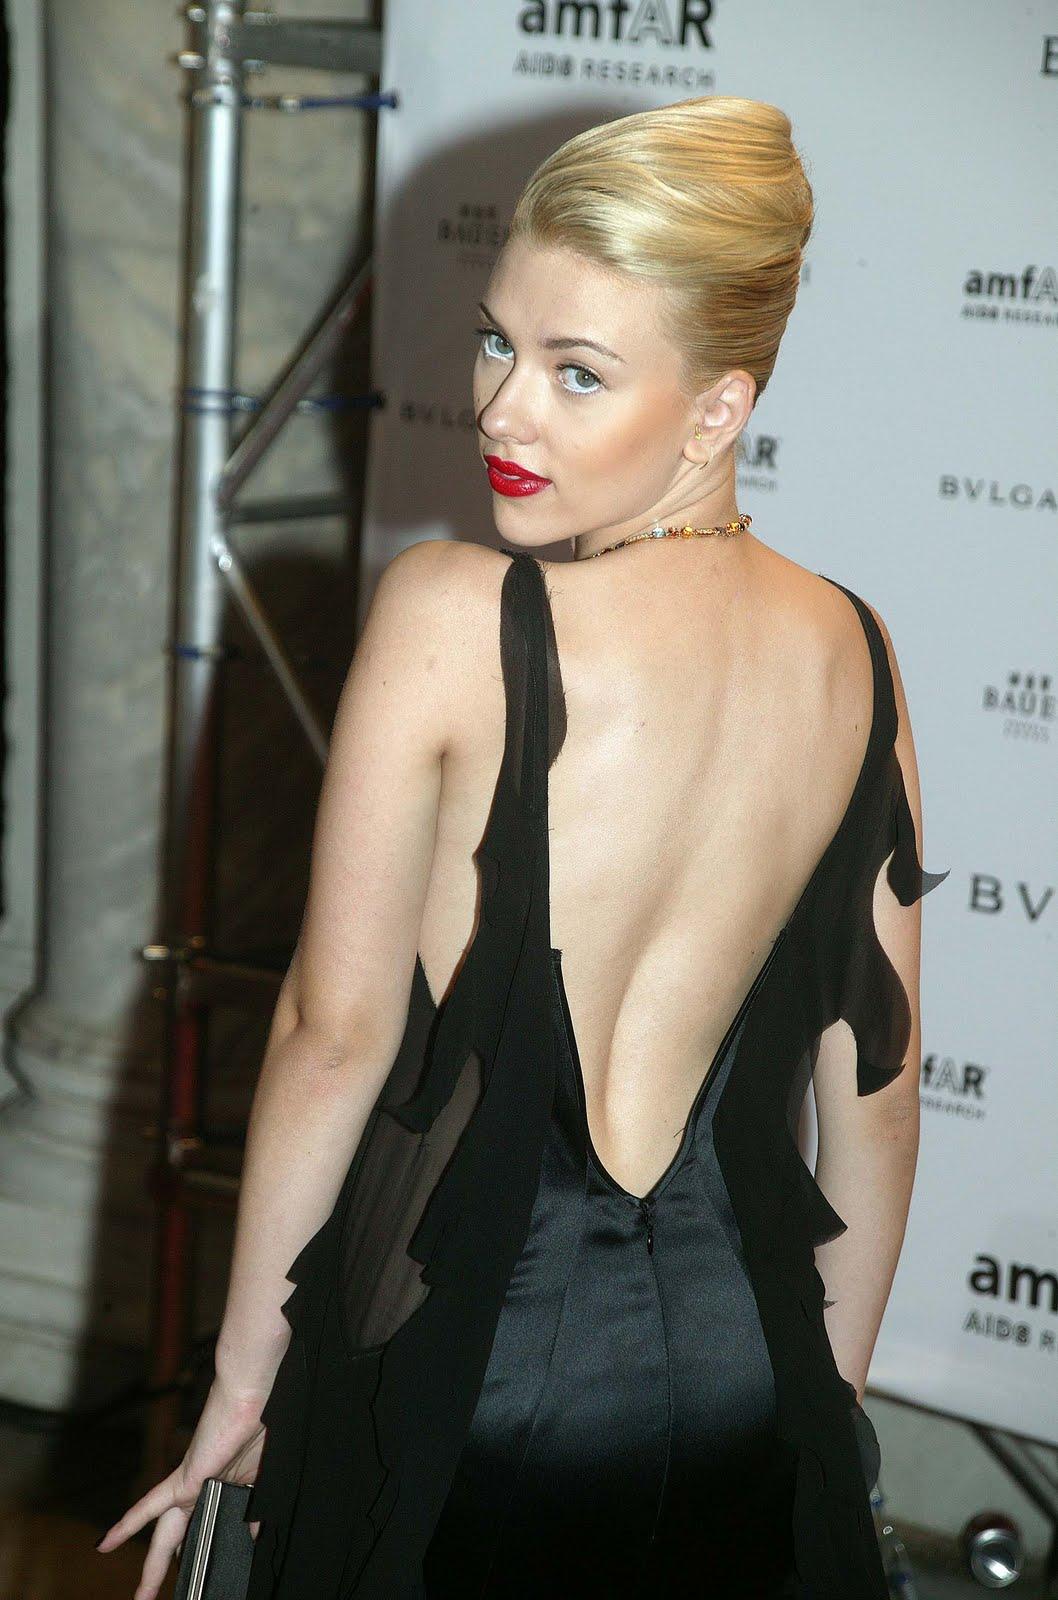 Scarlett johansson special pictures 13 film actresses - Scarlett johansson blogspot ...